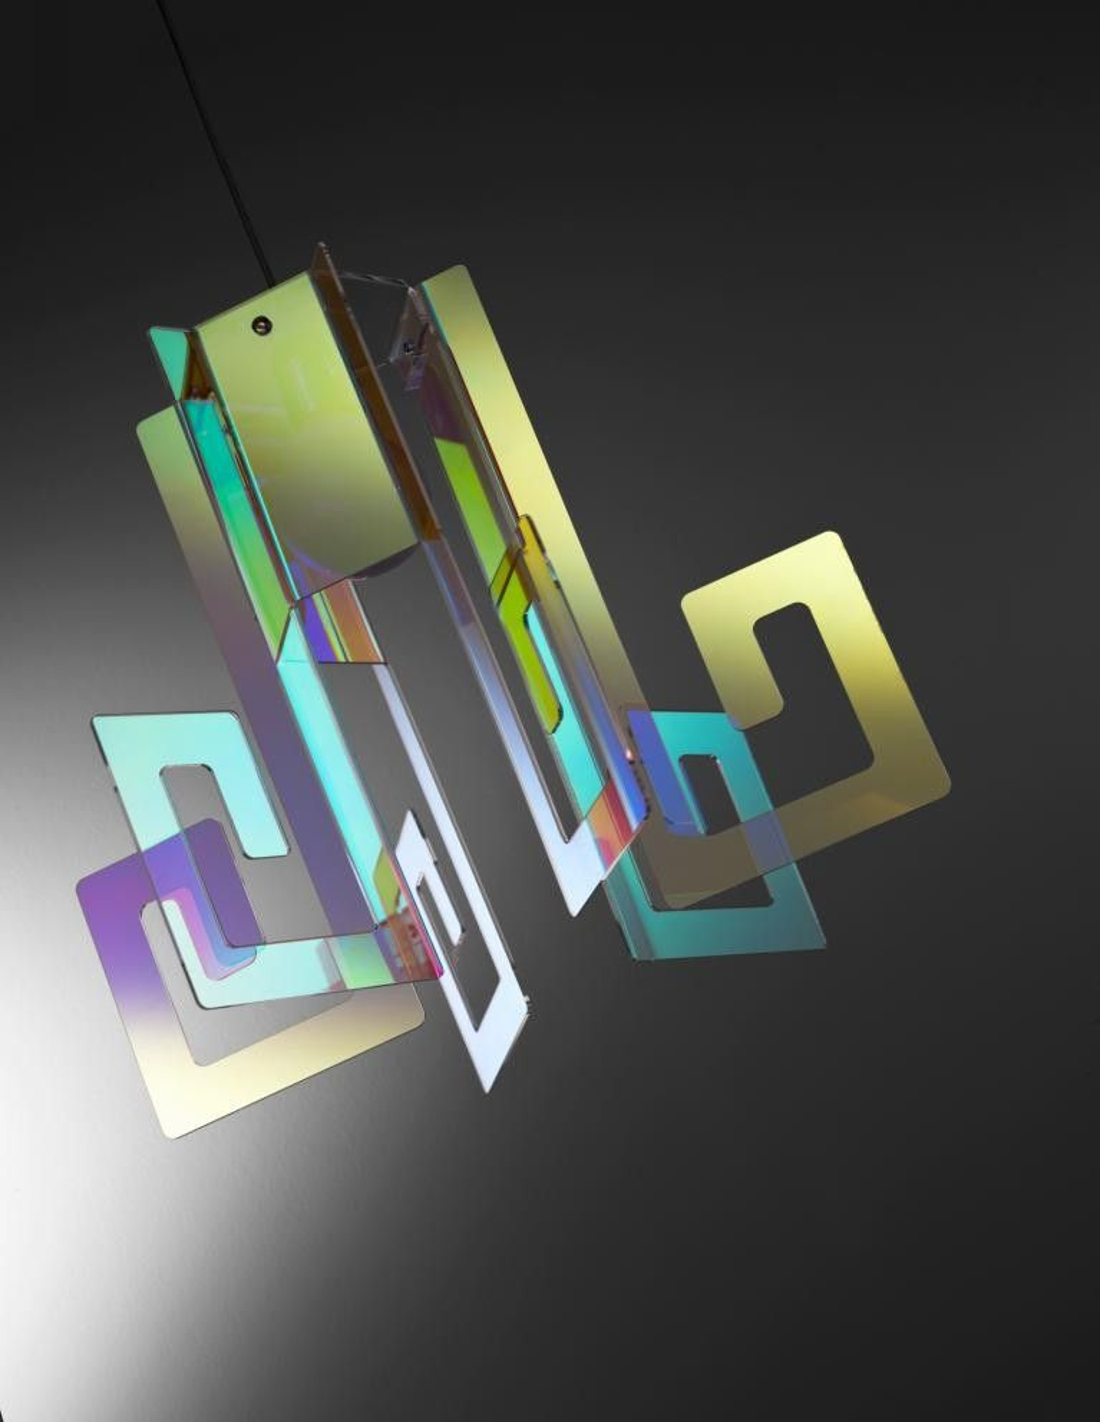 lampadari in plexiglass : Korona lampadario moderno a sospensione in plexiglass